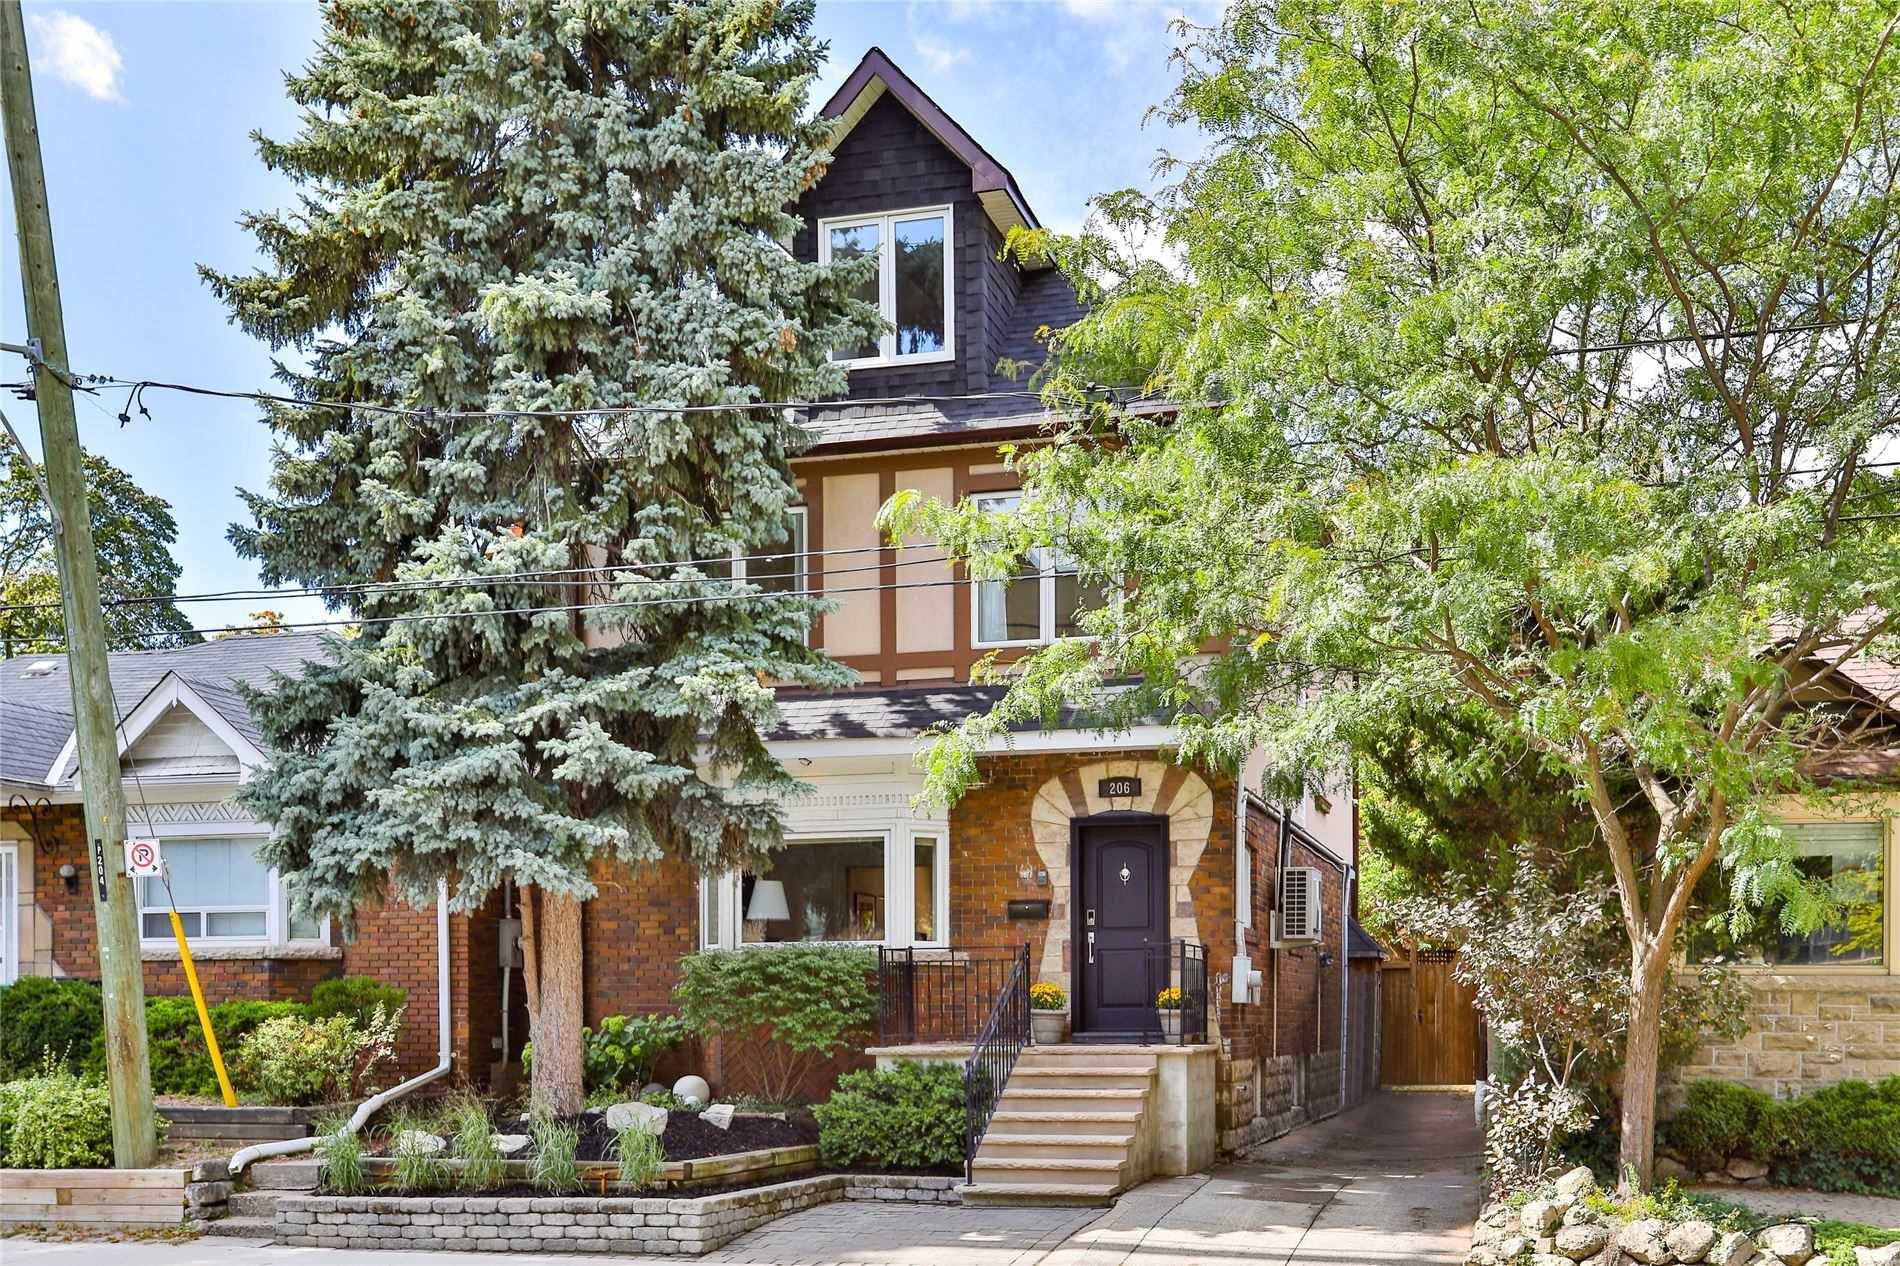 Main Photo: 206 Duplex Avenue in Toronto: Yonge-Eglinton House (2 1/2 Storey) for sale (Toronto C03)  : MLS®# C4934258